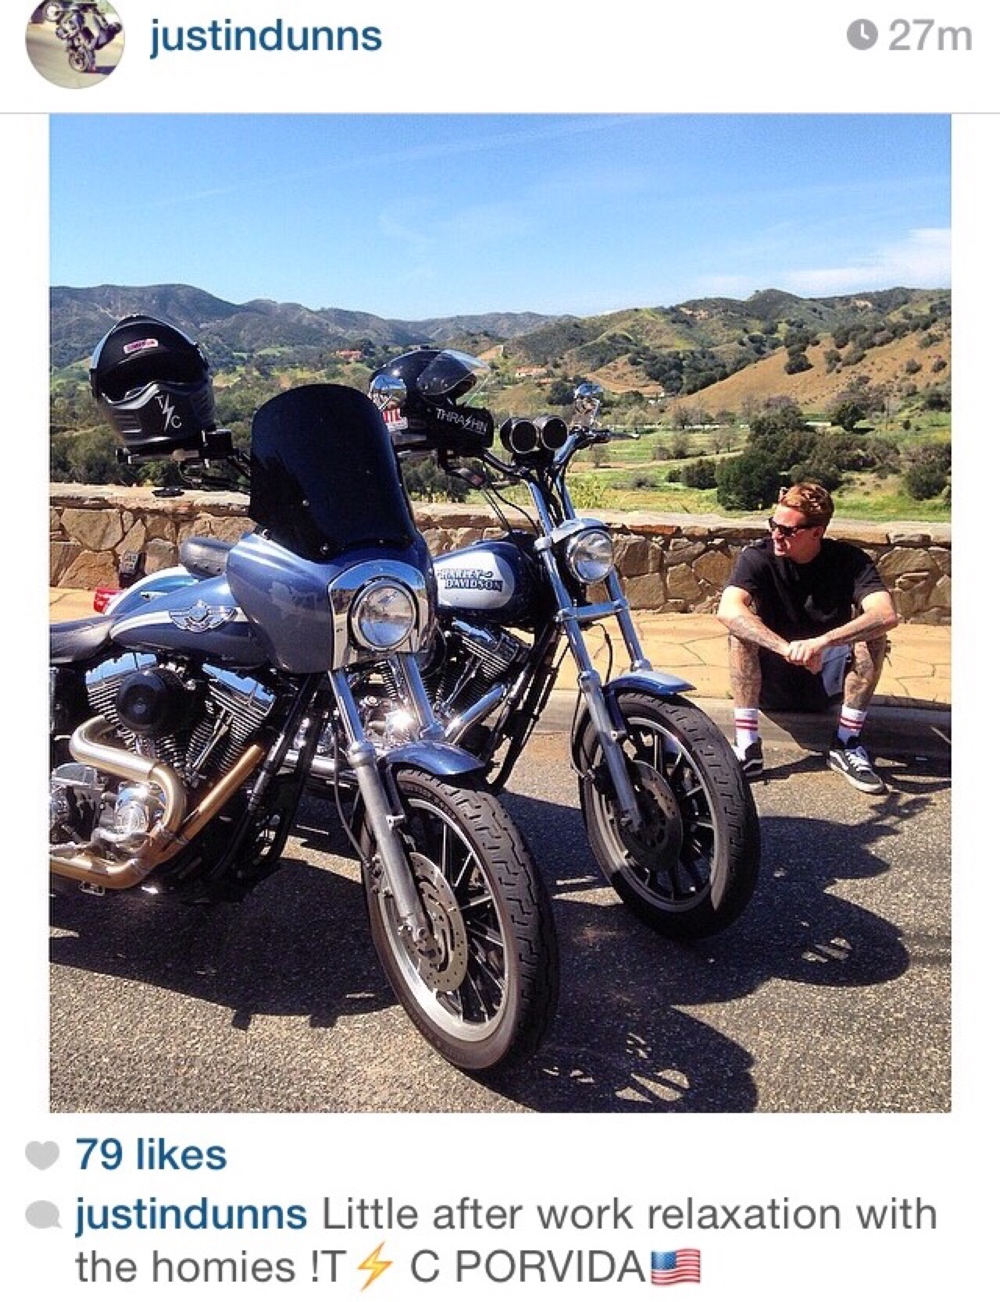 American Harley Davidson freedom ride